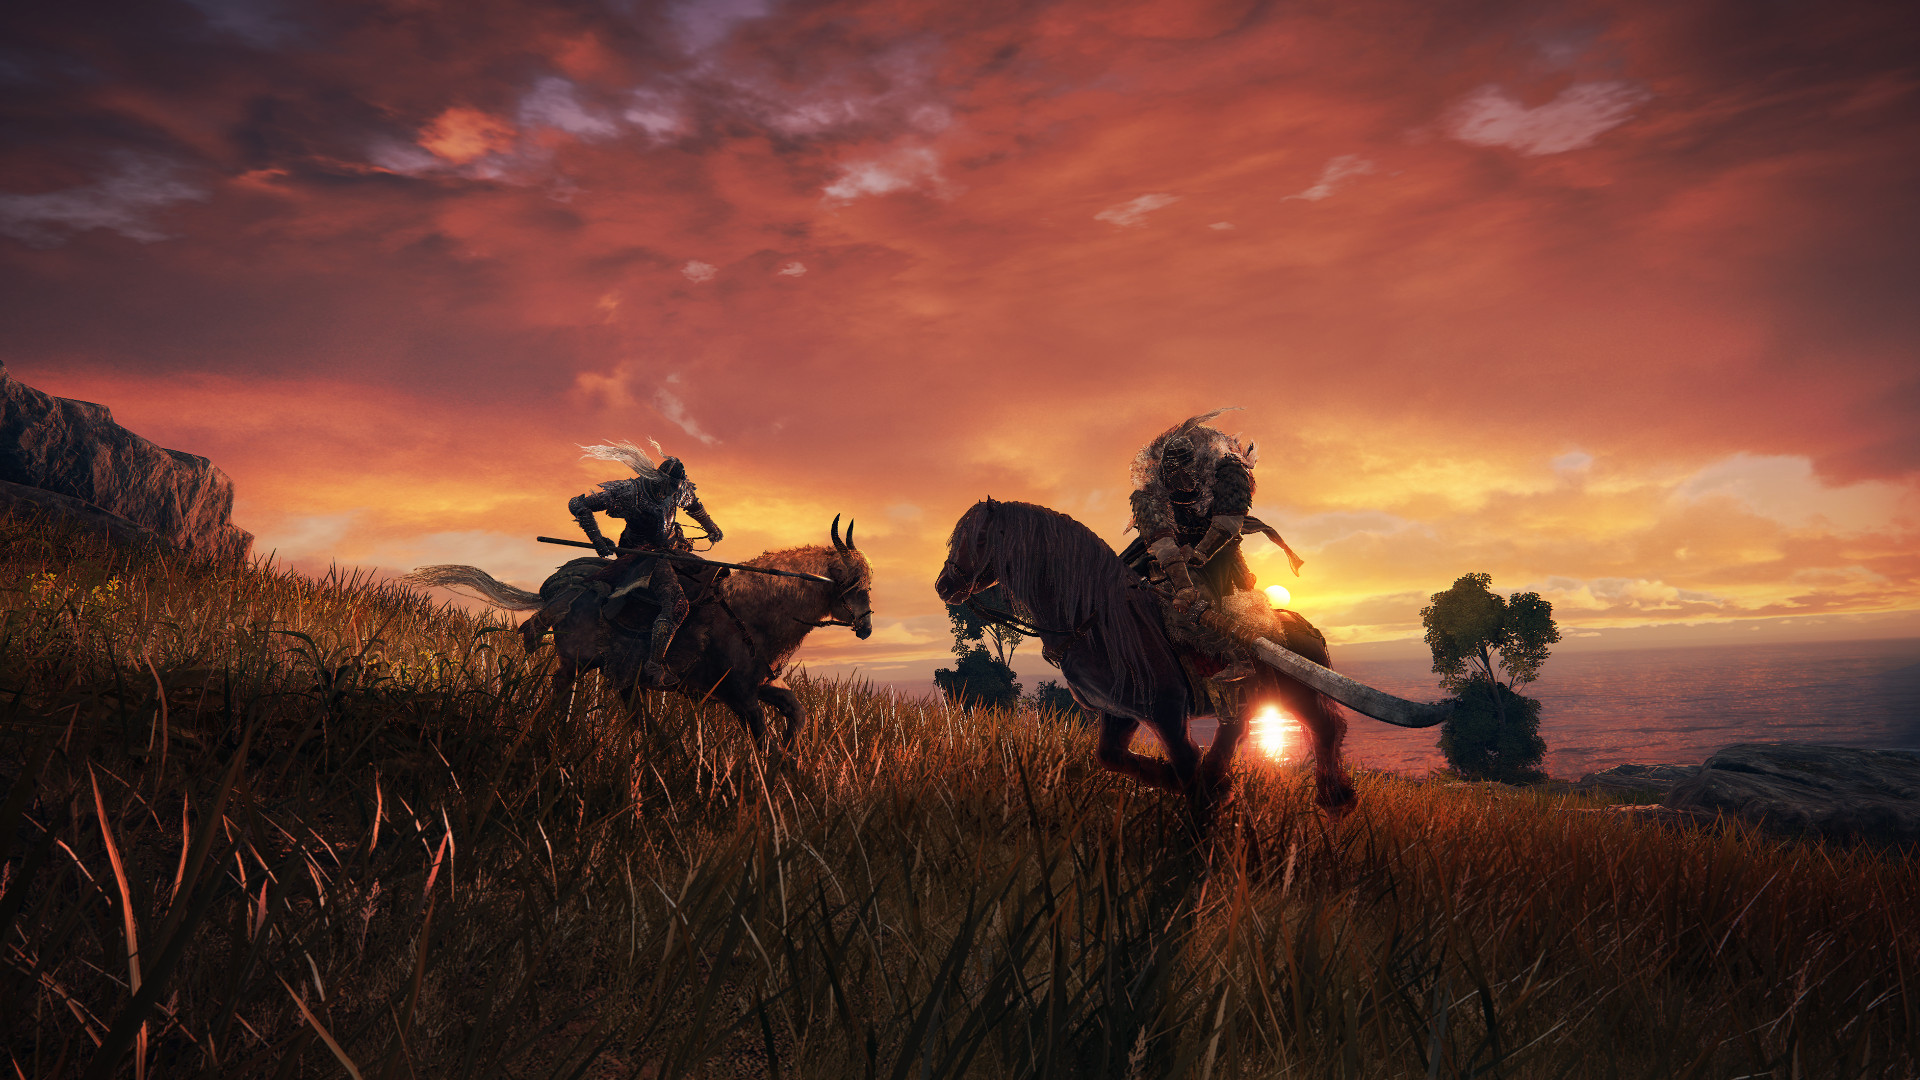 Geoff Keighly confirms details for the two-hour Gamescom show